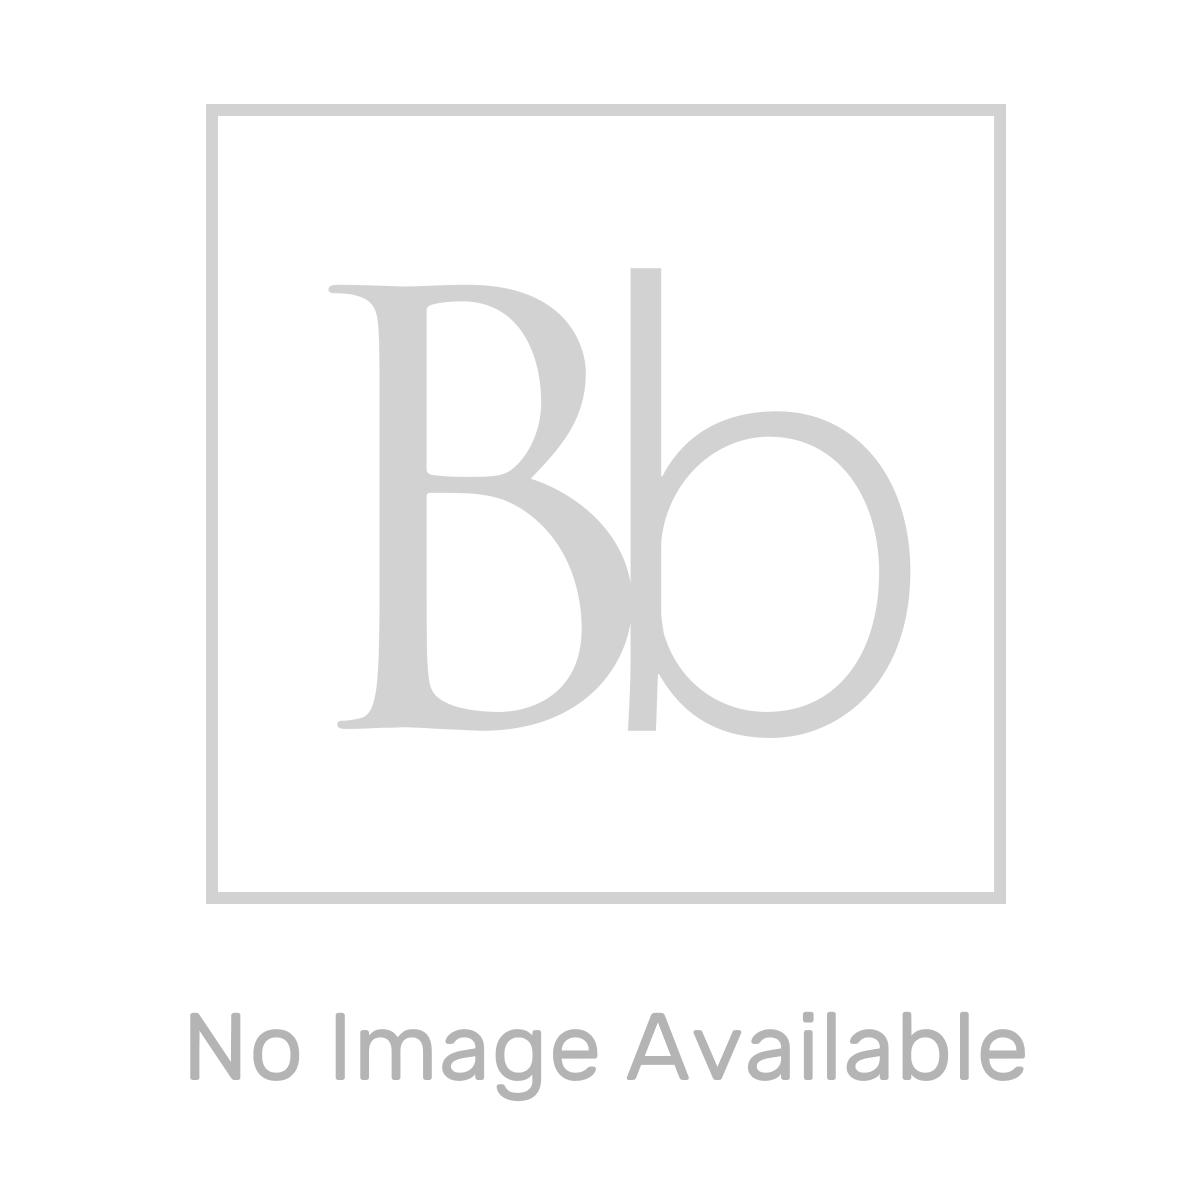 Aquadart Rectangular 1100 x 800 Shower Tray Line Drawing